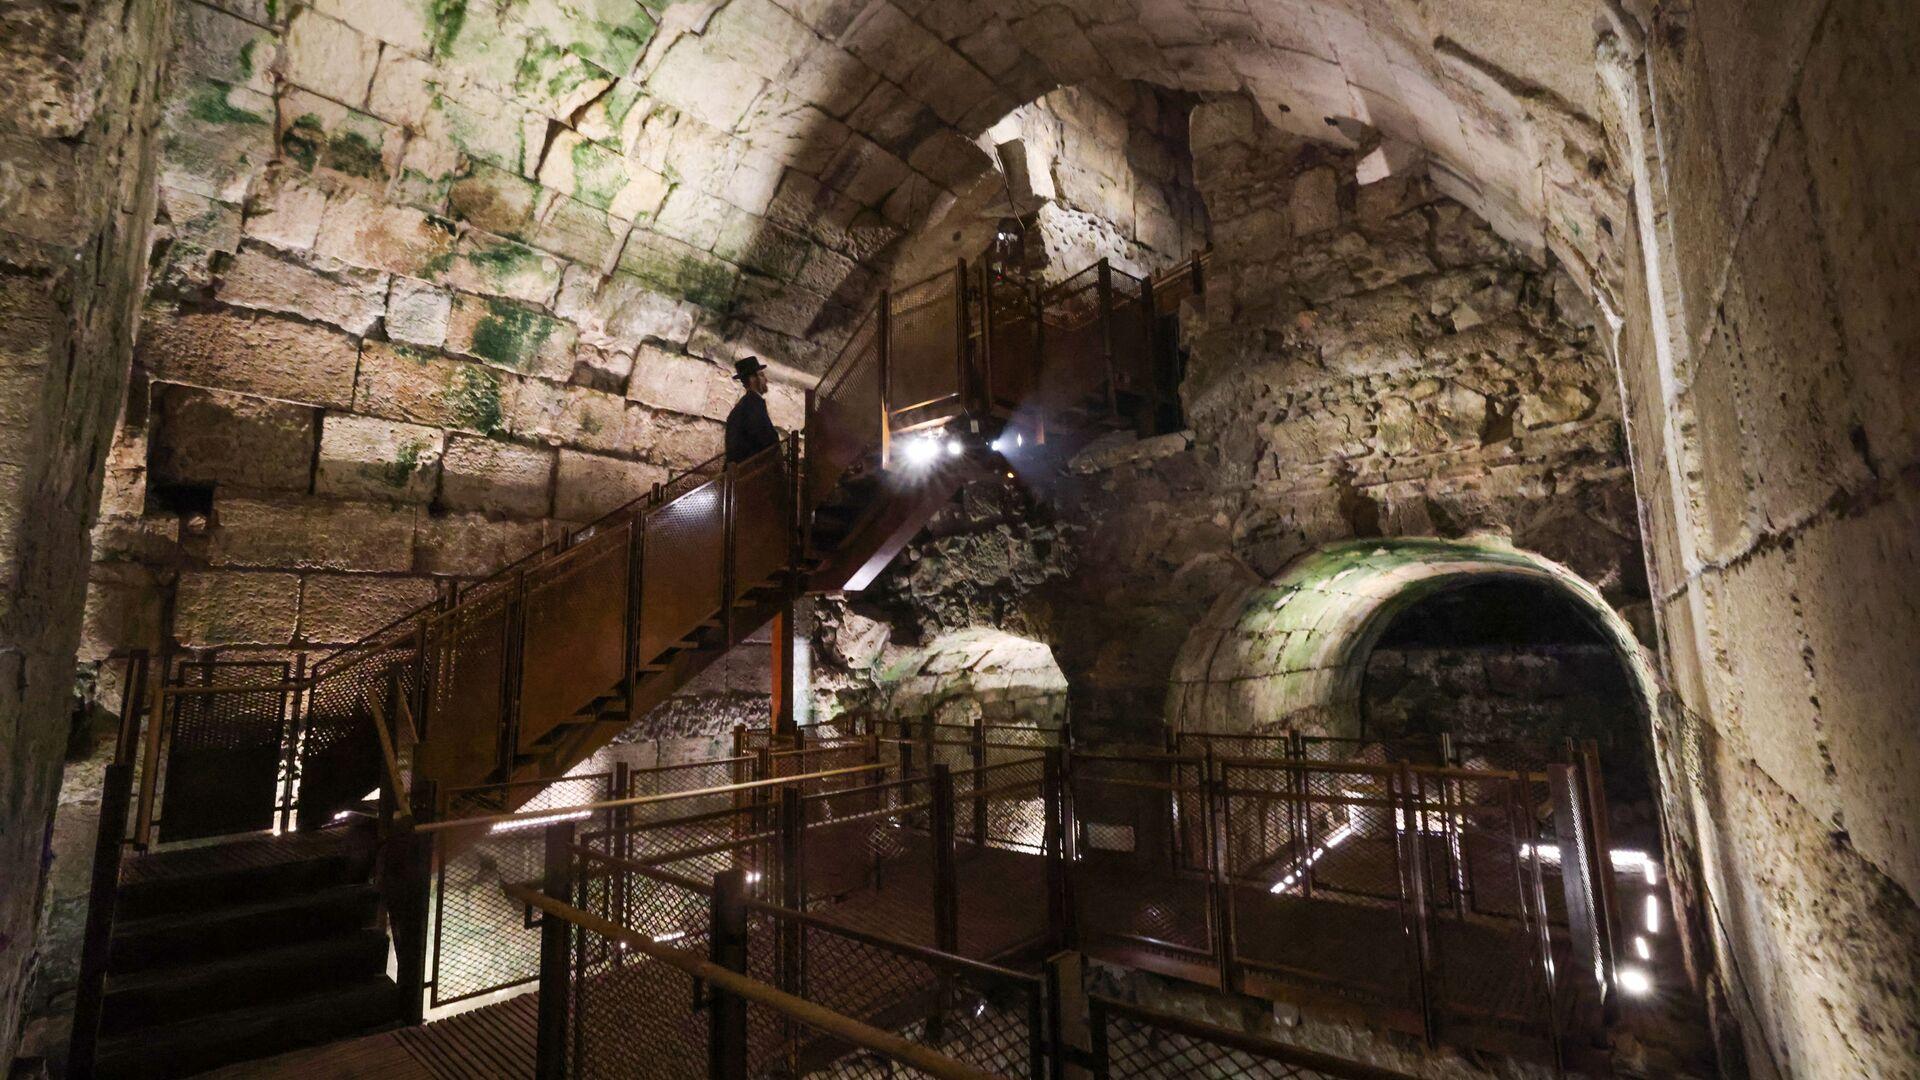 Jevrejin posmatra delove javne zgrade iz perioda Drugog hrama (516. p.n.e. – 70. n.e.) koja se smatra jednom od najluksuznijih do danas nađenih - Sputnik Srbija, 1920, 12.07.2021